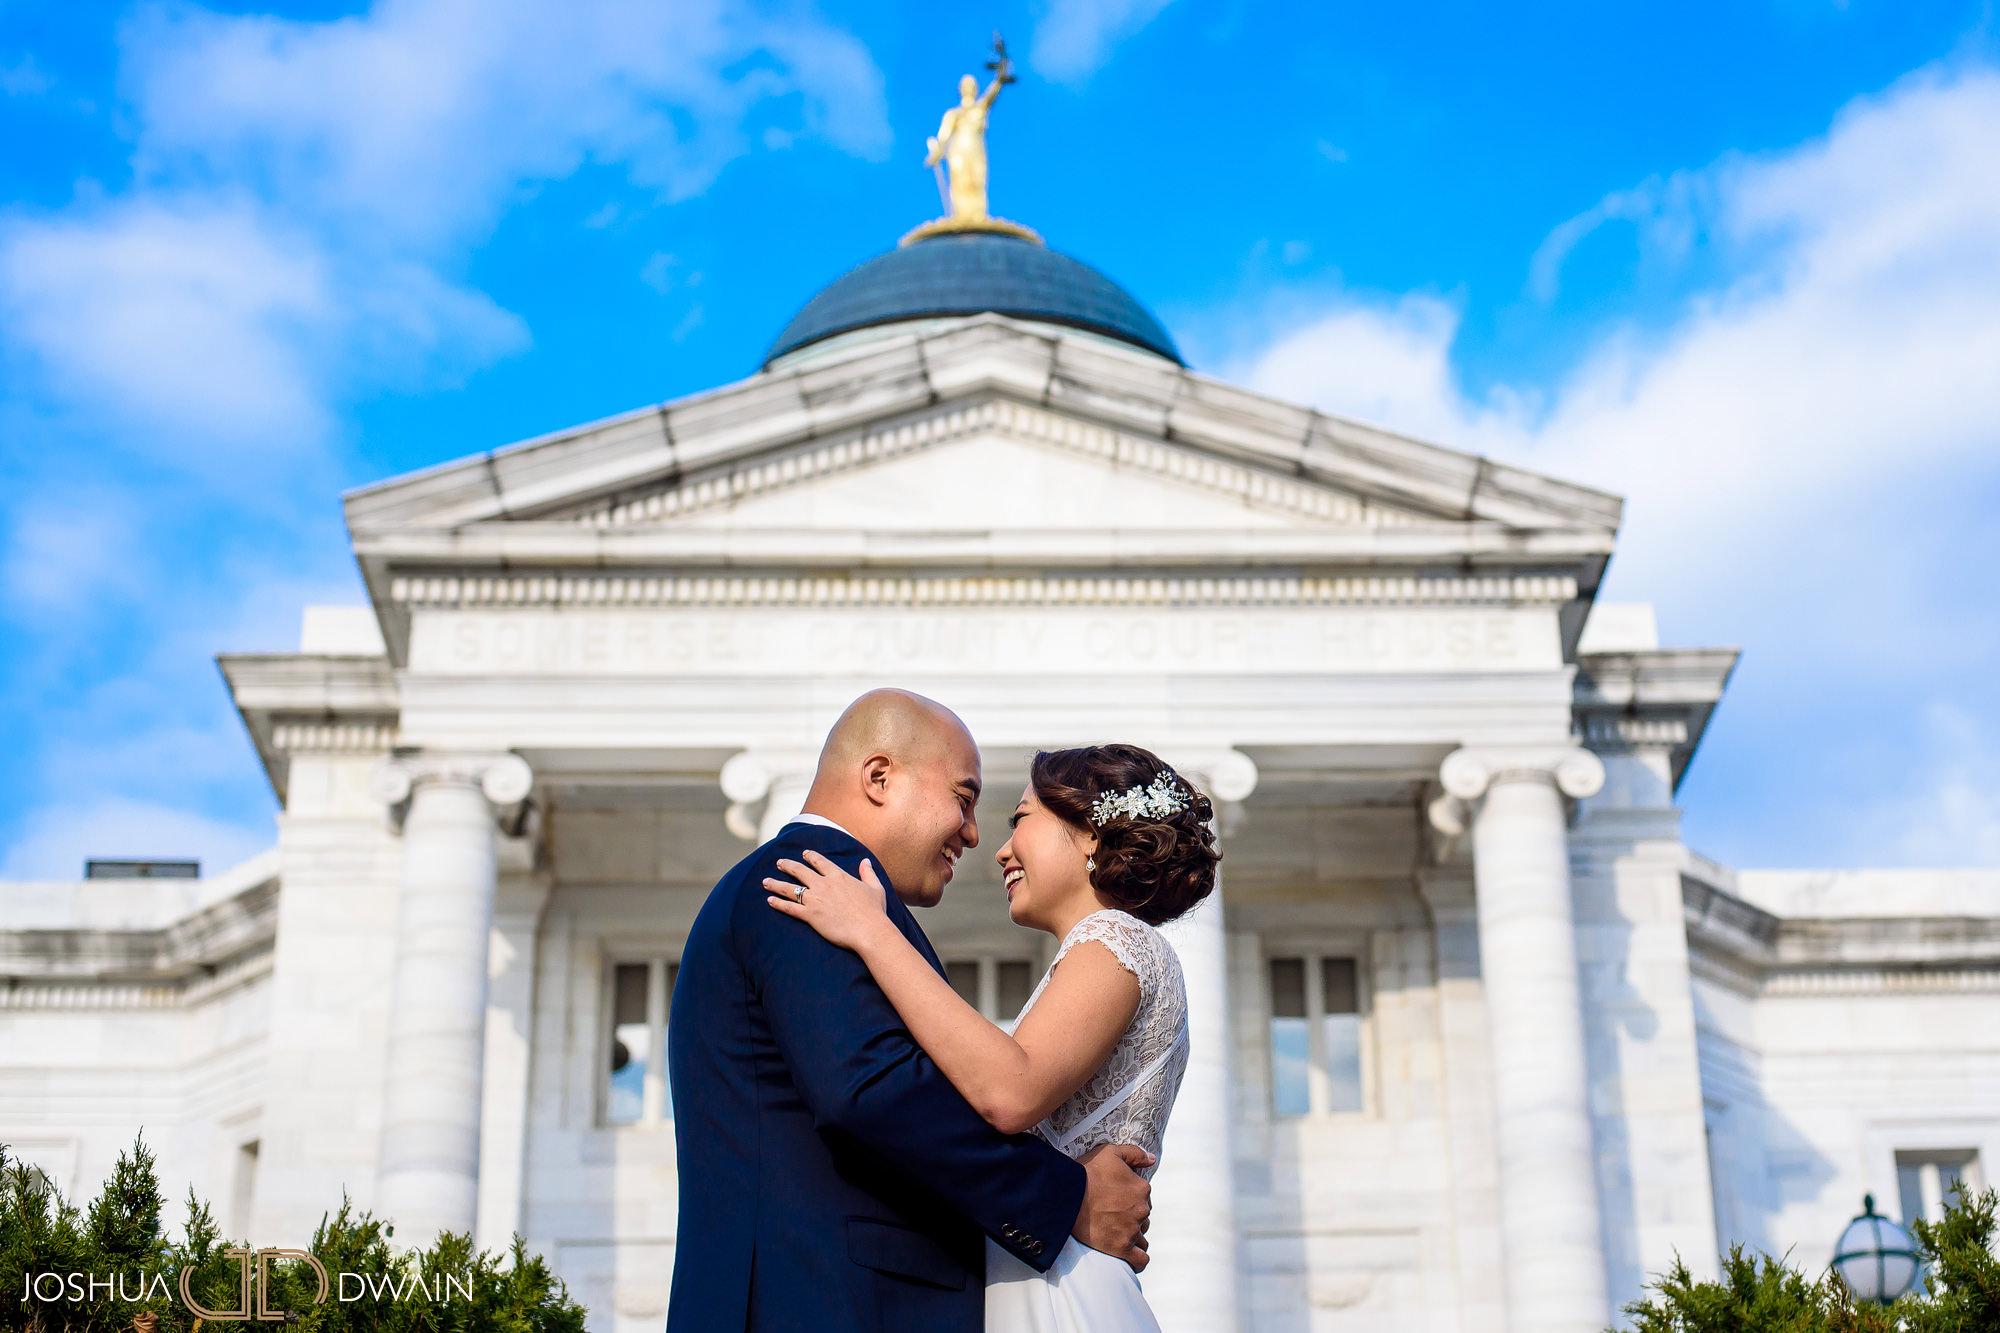 yanshu-michael-26-somerset-courthouse-elopement-wedding-joshua-dwain